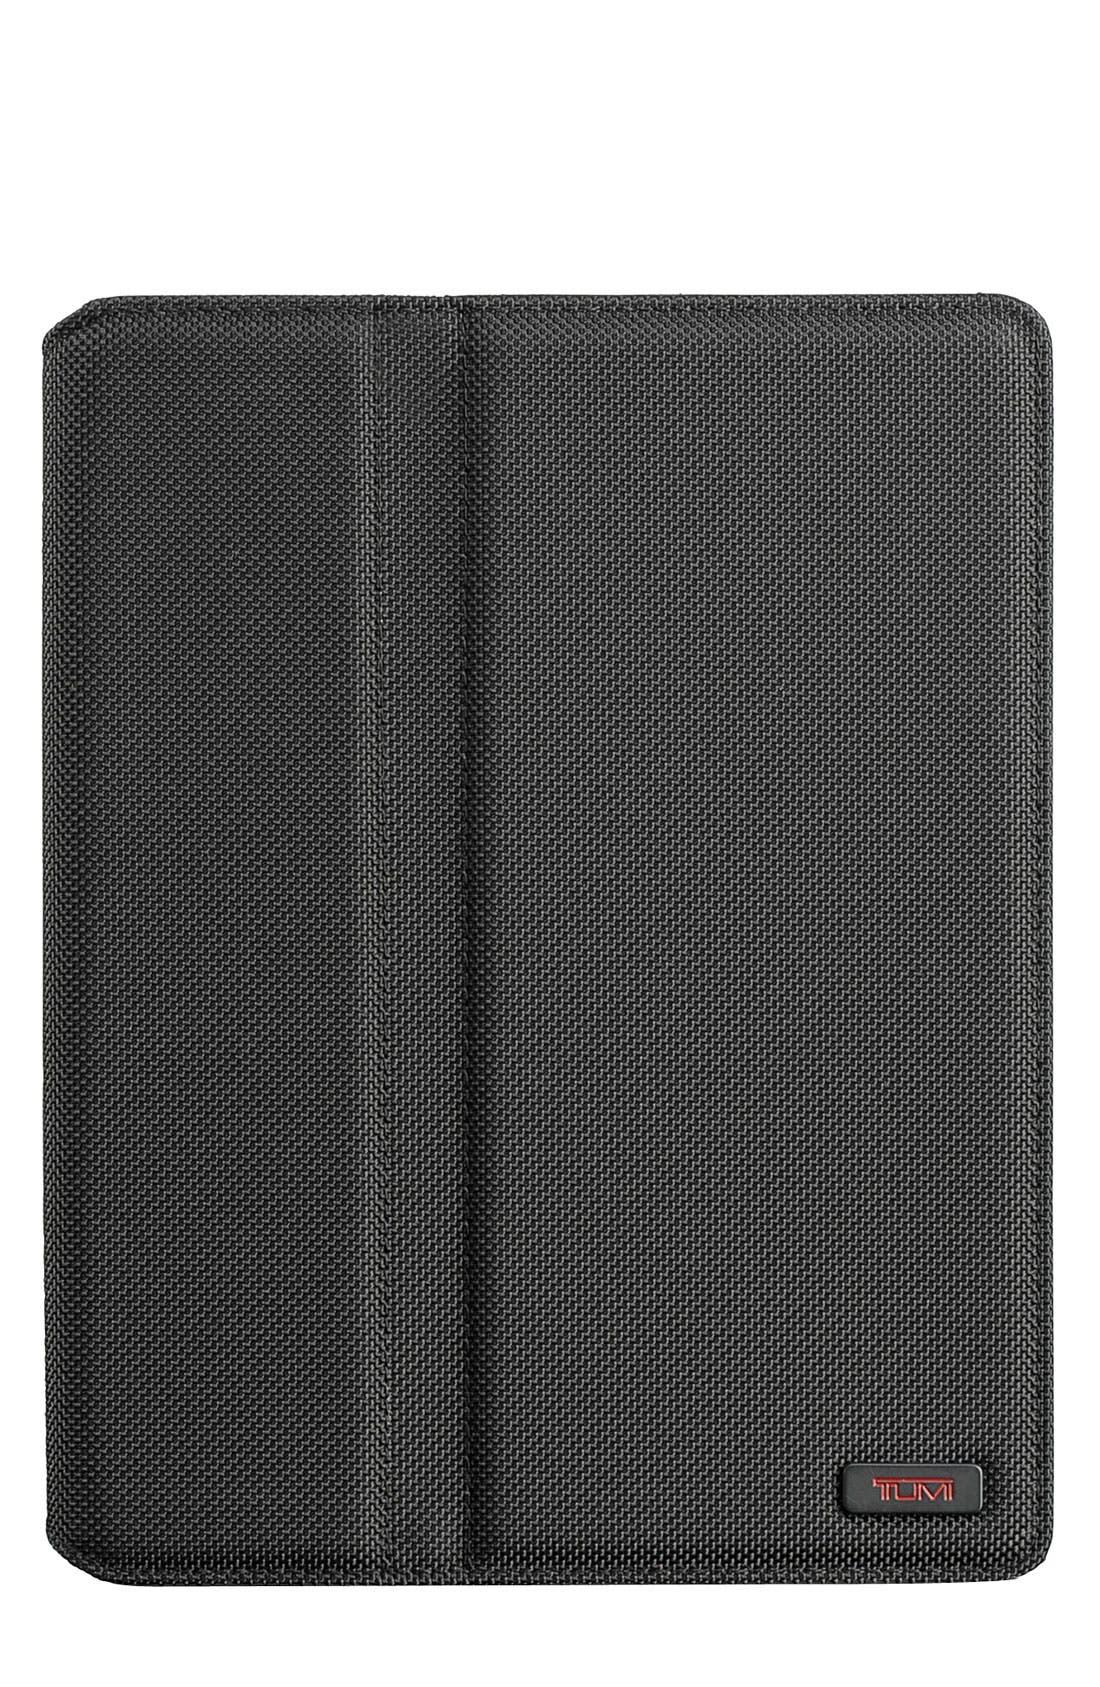 Main Image - Tumi Ballistic Nylon iPad 2 Cover